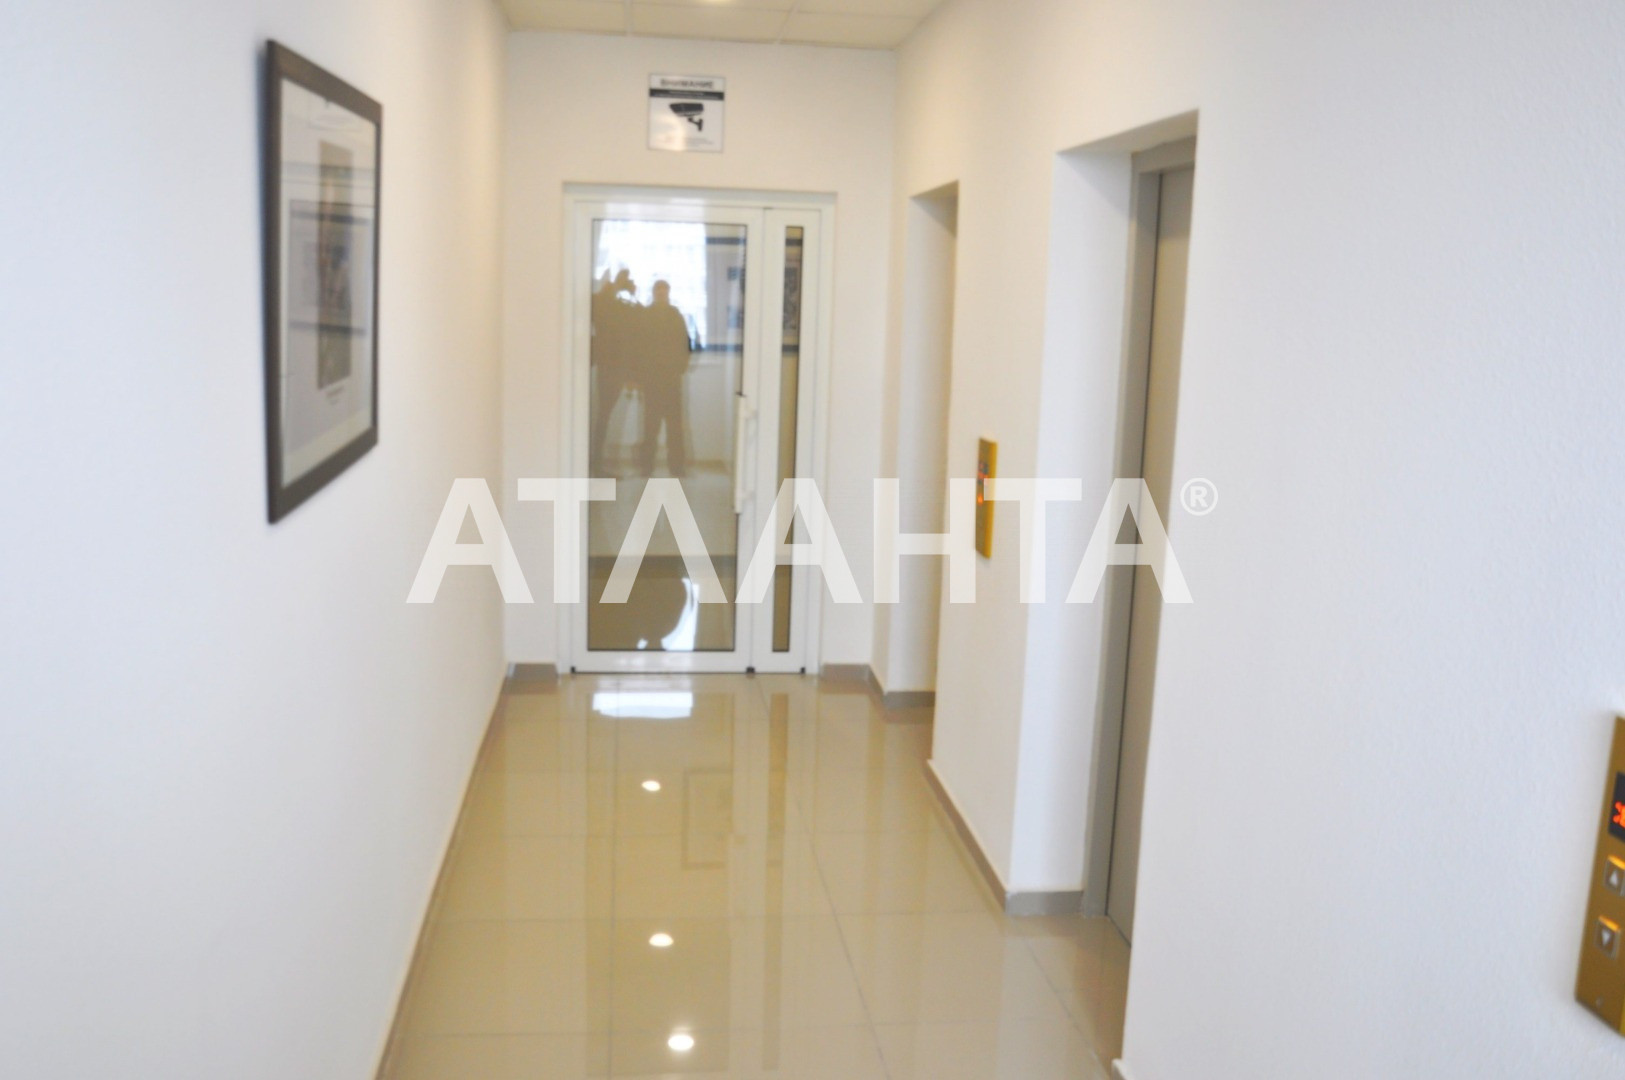 Продается 2-комнатная Квартира на ул. Генуэзская — 68 100 у.е. (фото №8)